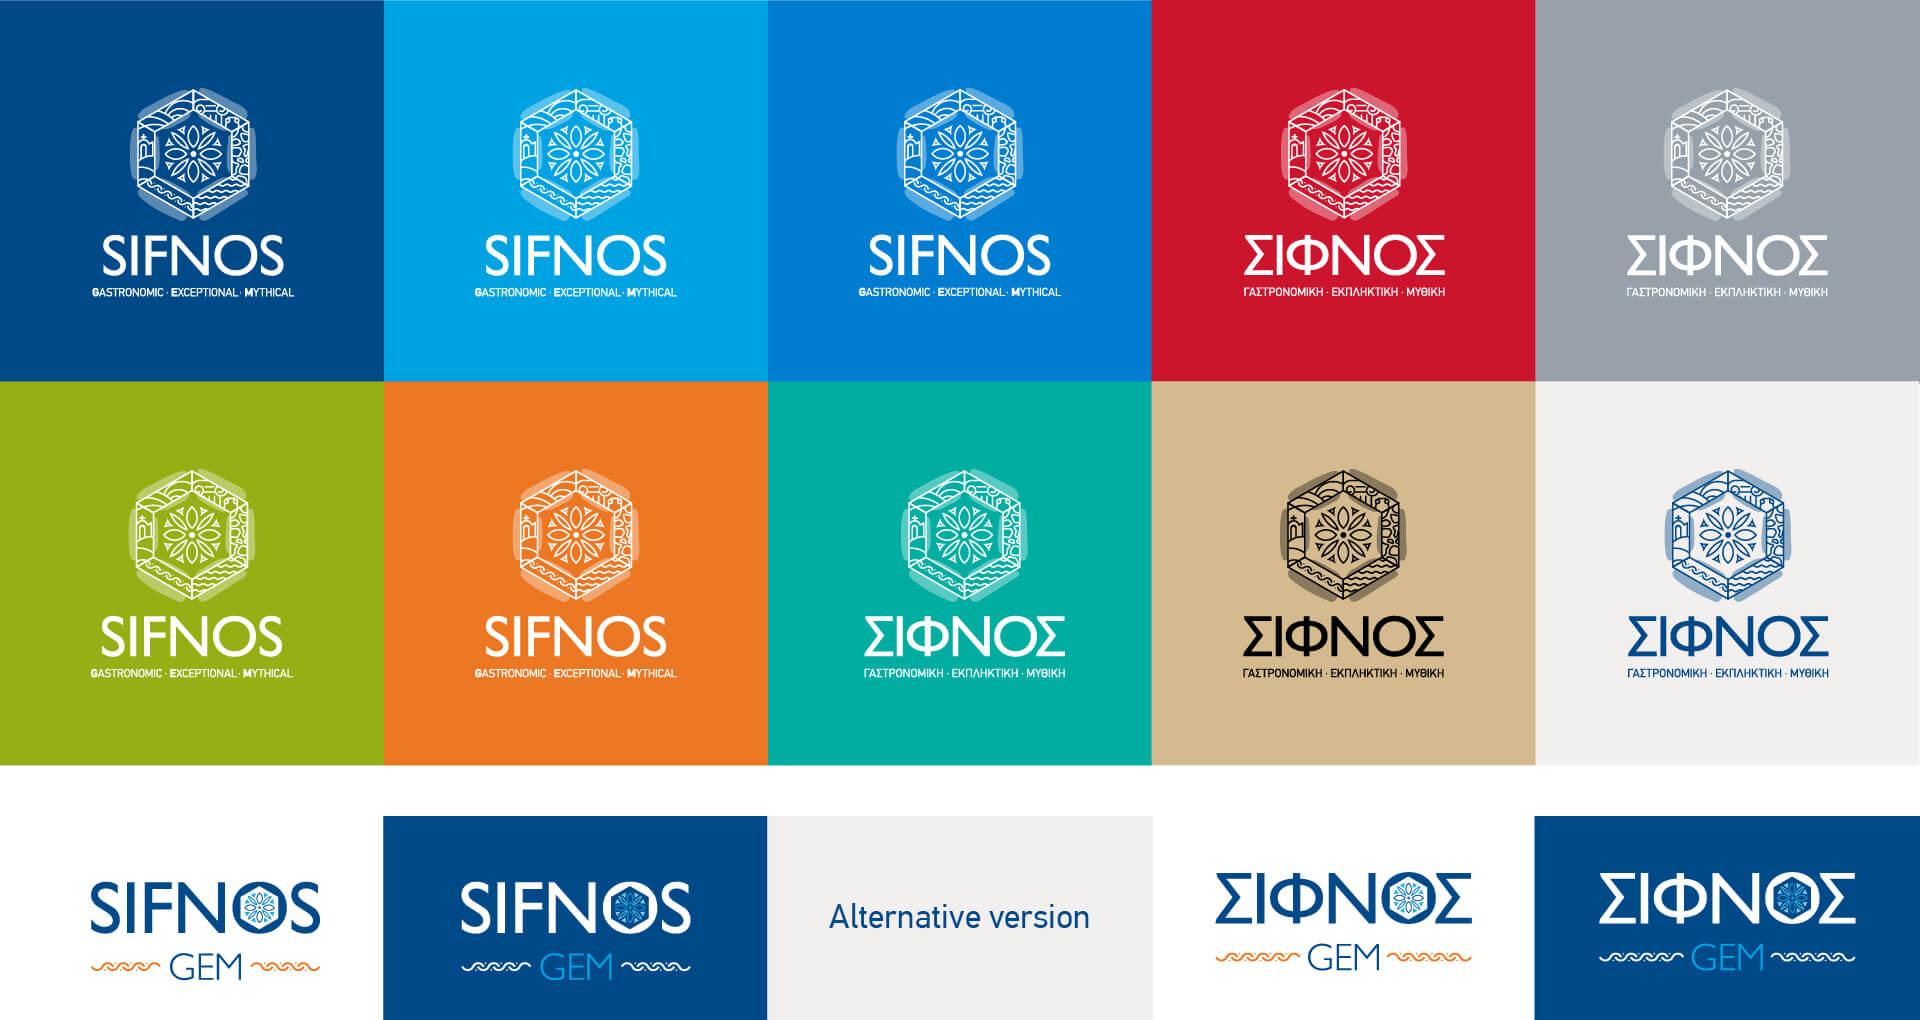 7-Sifnos-Rebranding-2021